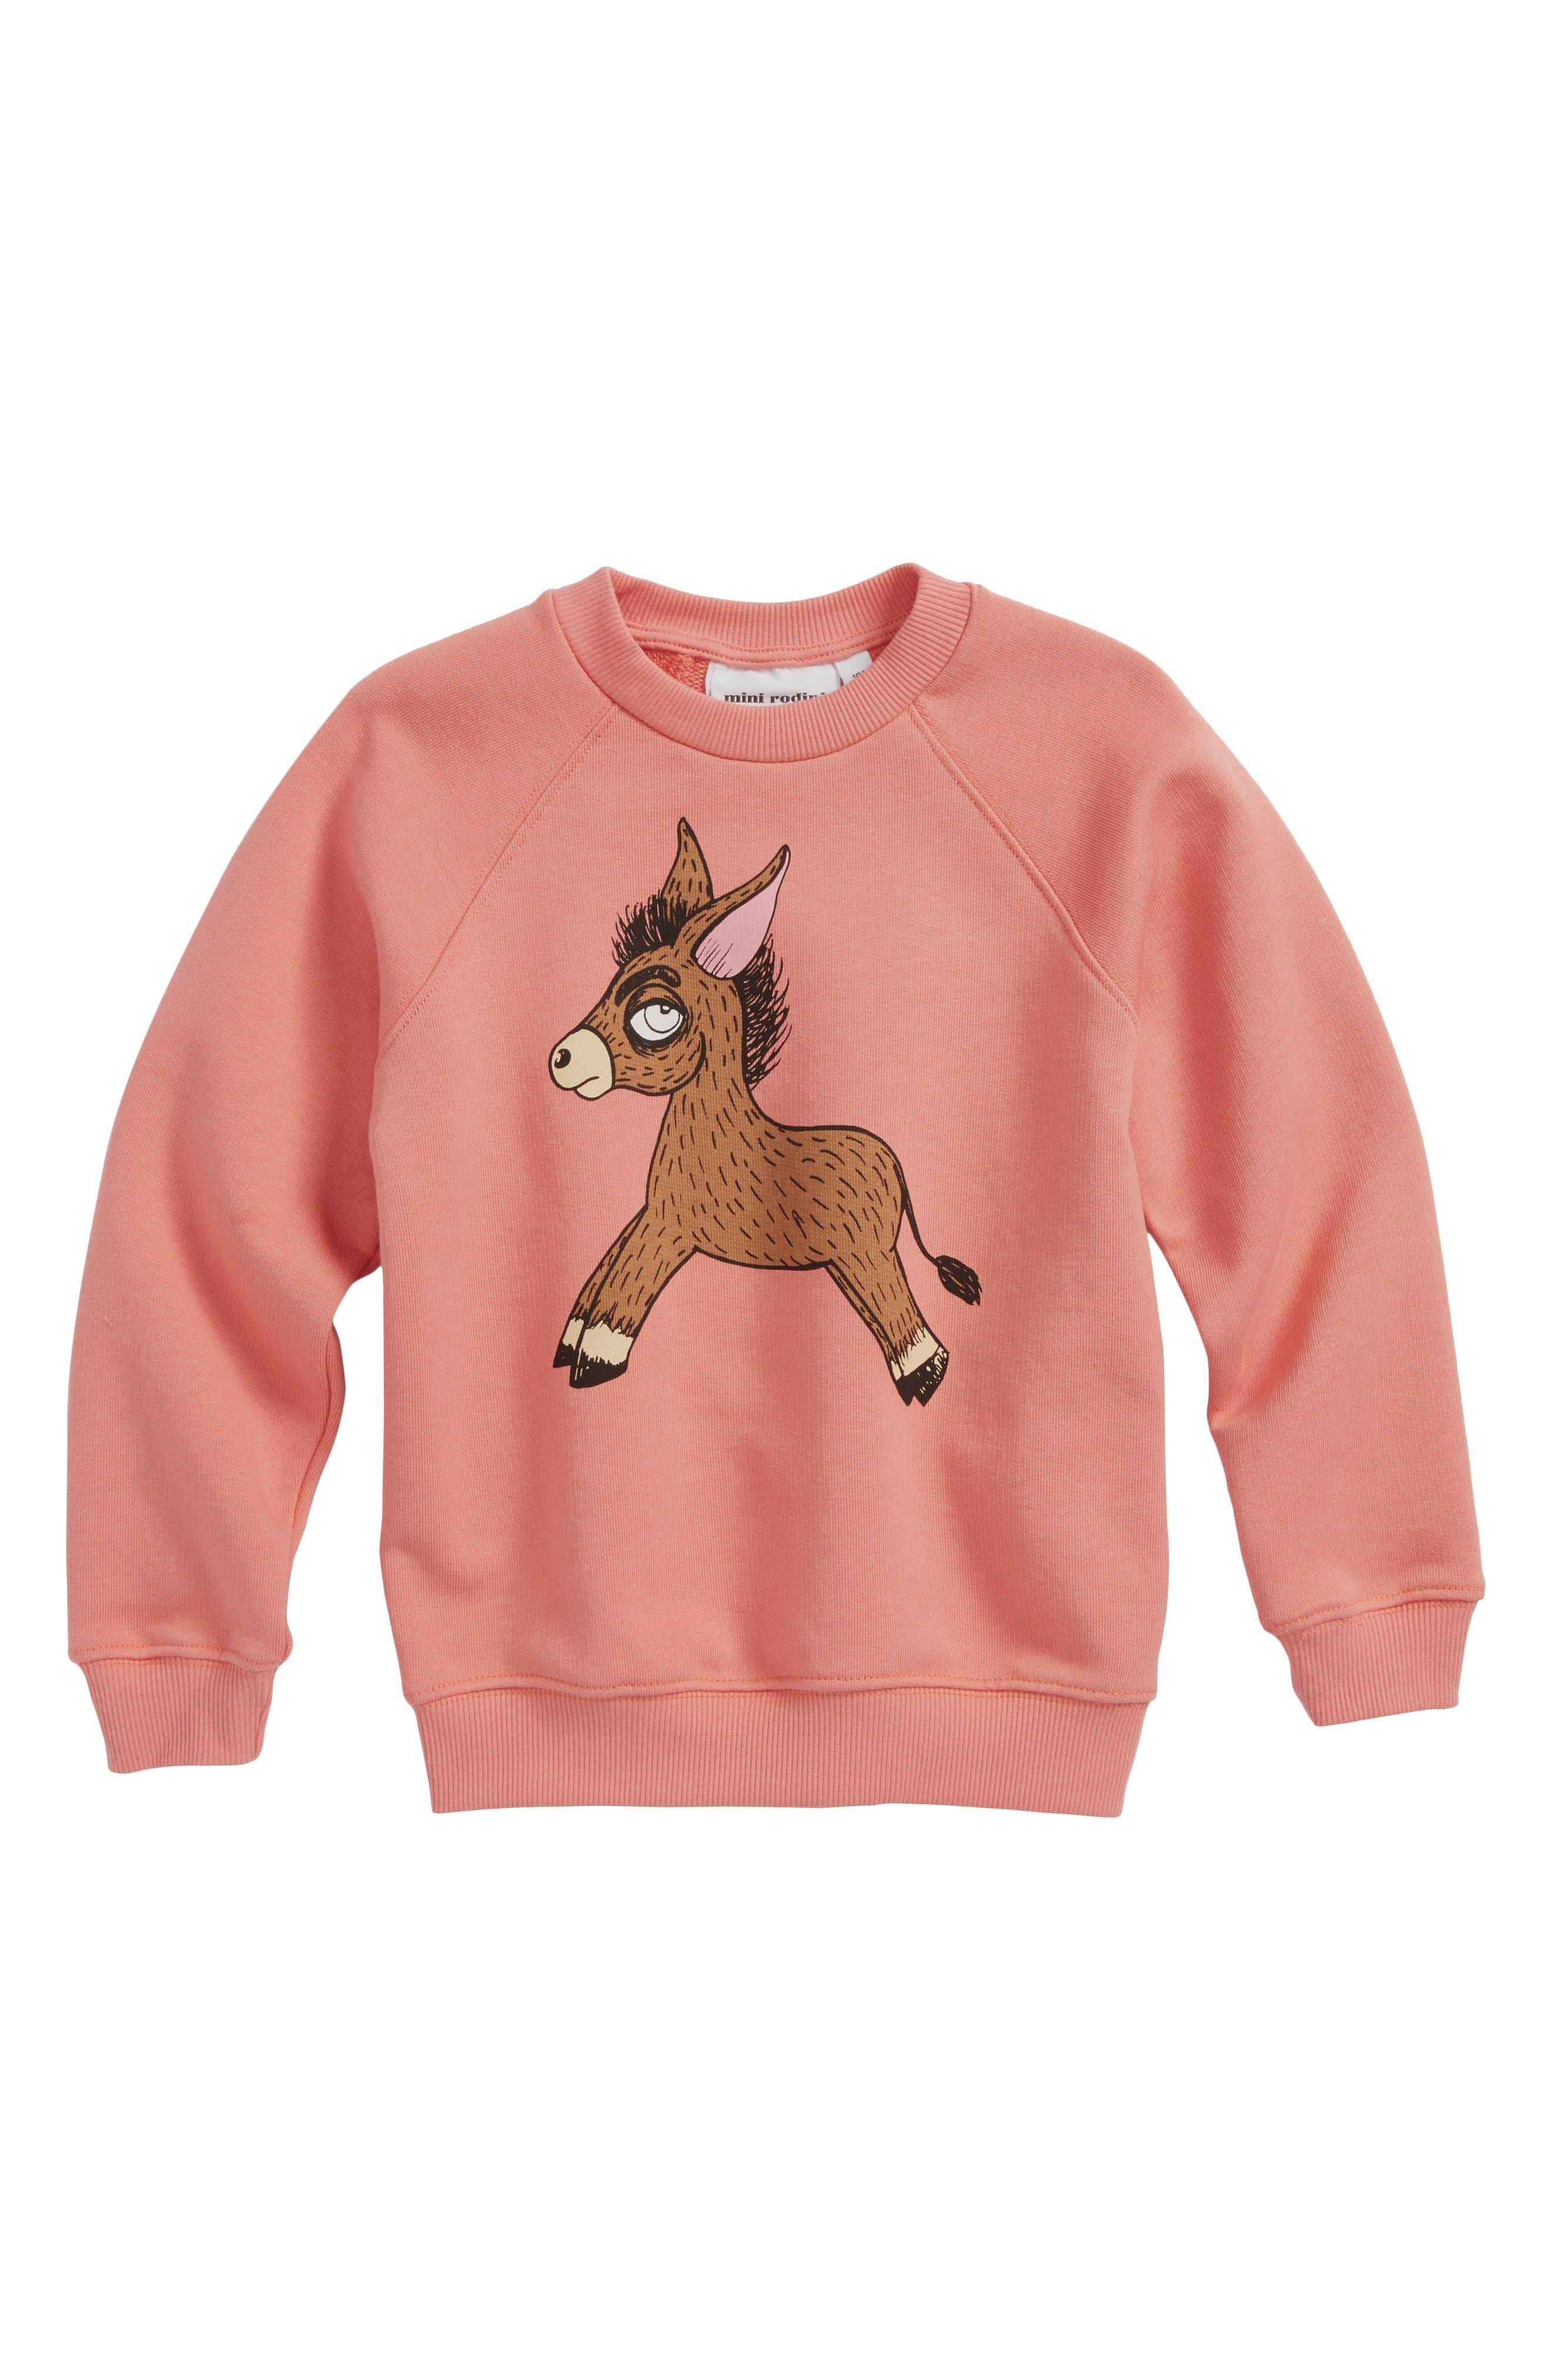 Donkey Organic Cotton Sweatshirt,                             Main thumbnail 1, color,                             Pink